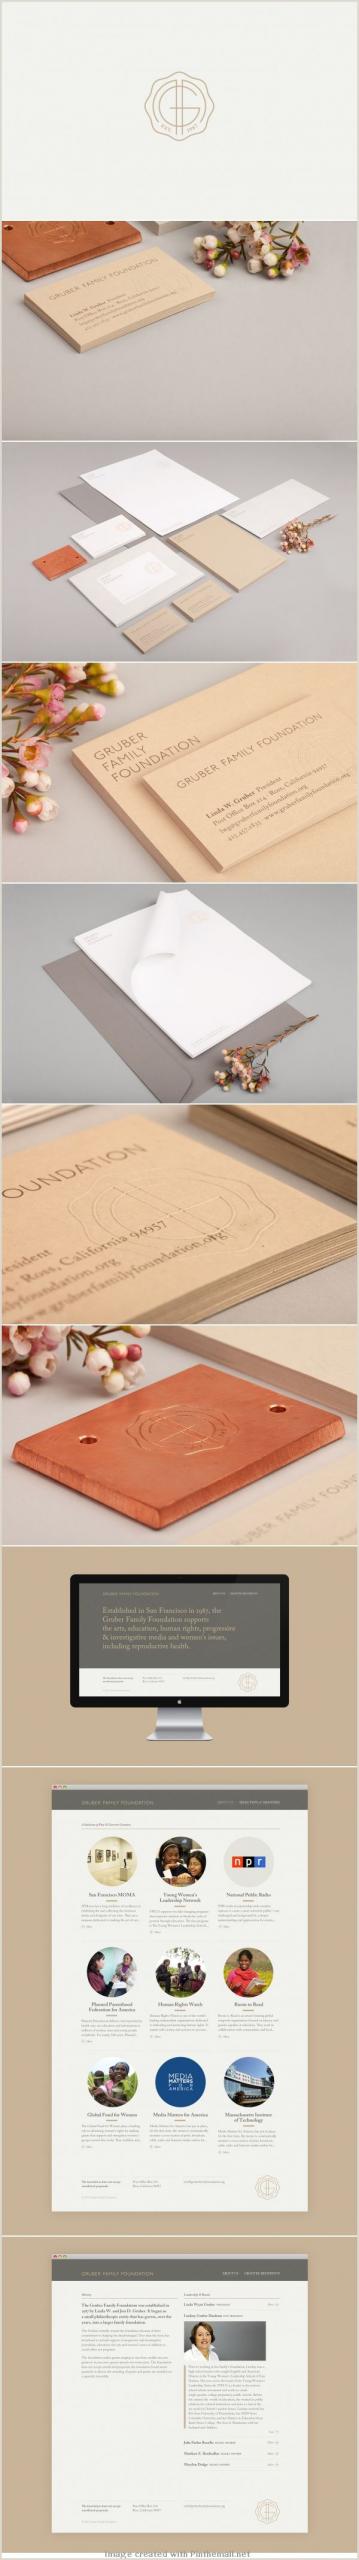 Business Card Styles 14 Popular Hardwood Flooring Business Card Template